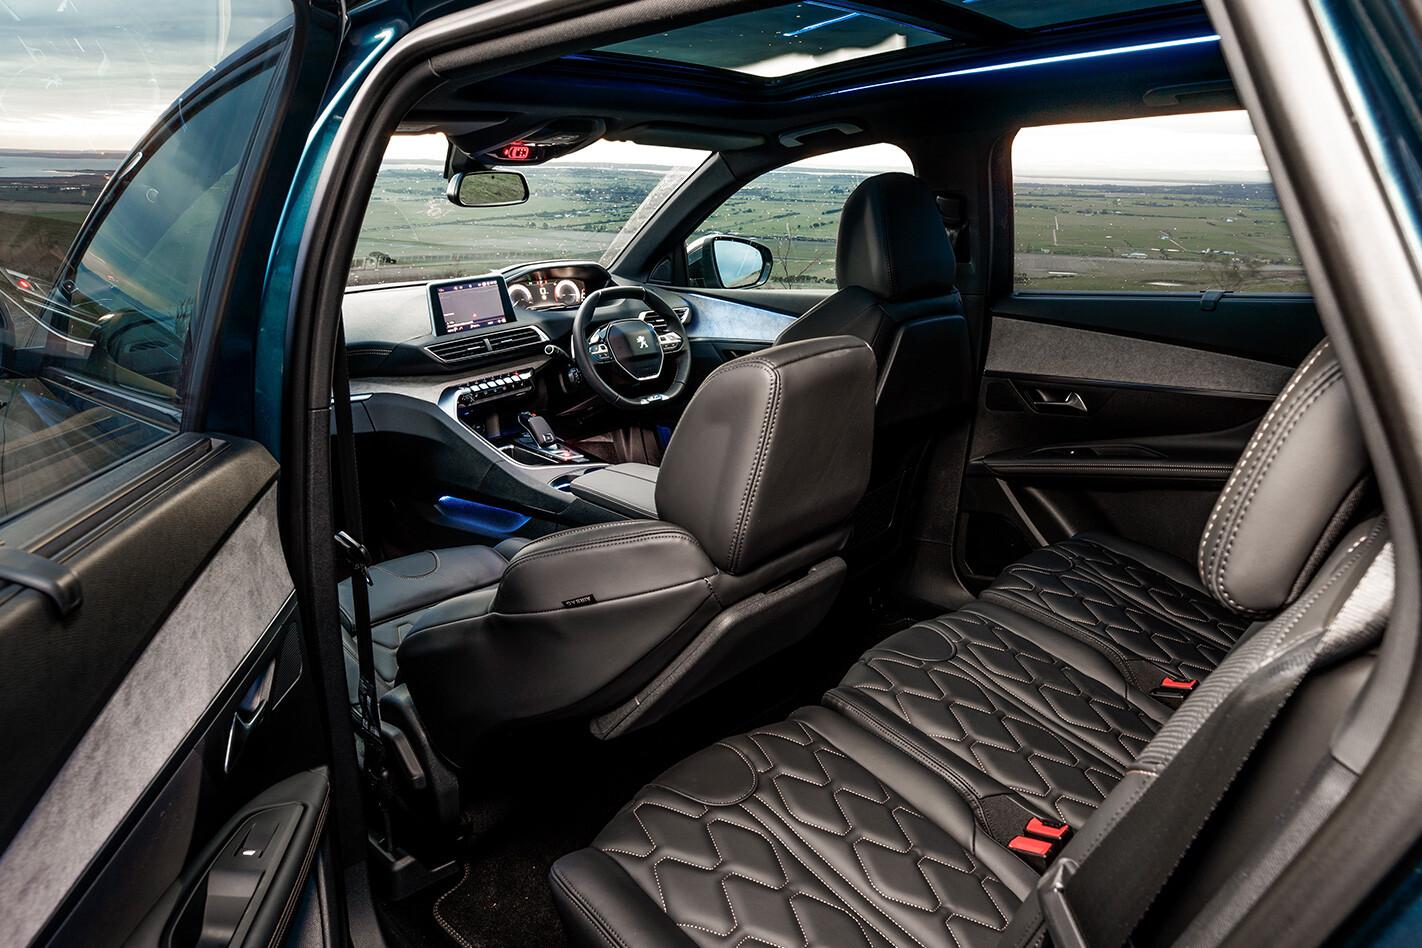 Seven Seat Suv Peugeot Interior Jpg